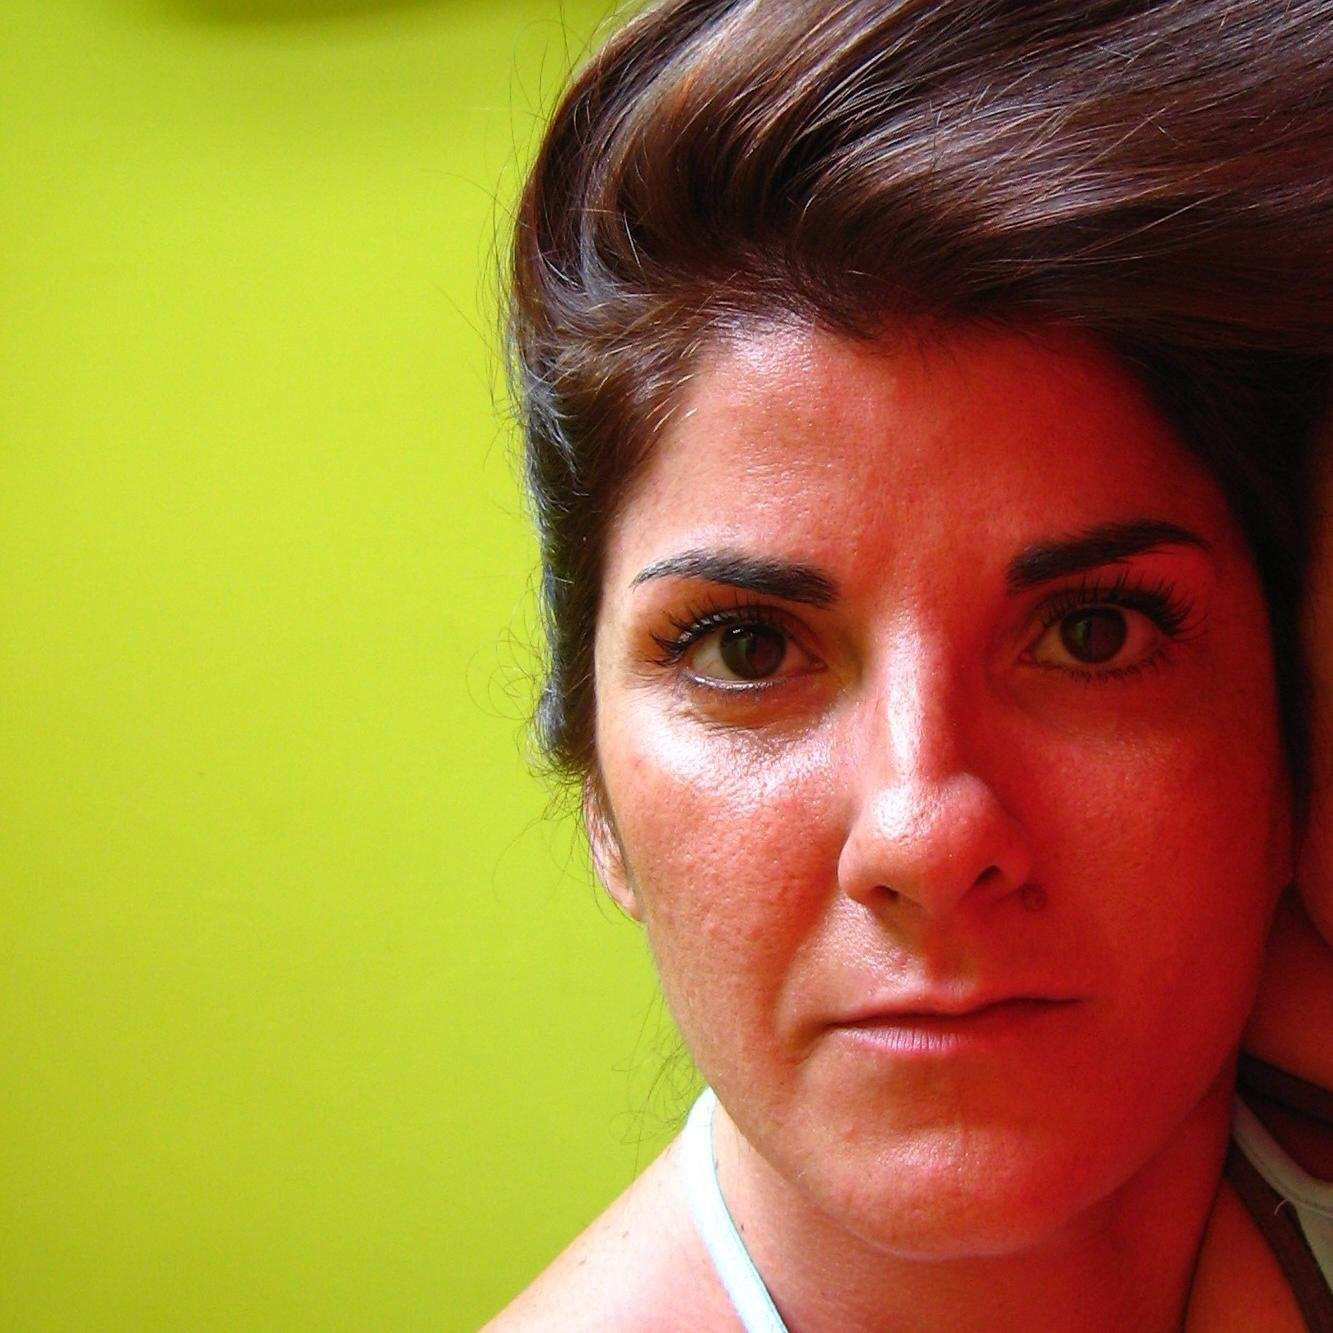 María Tortosa